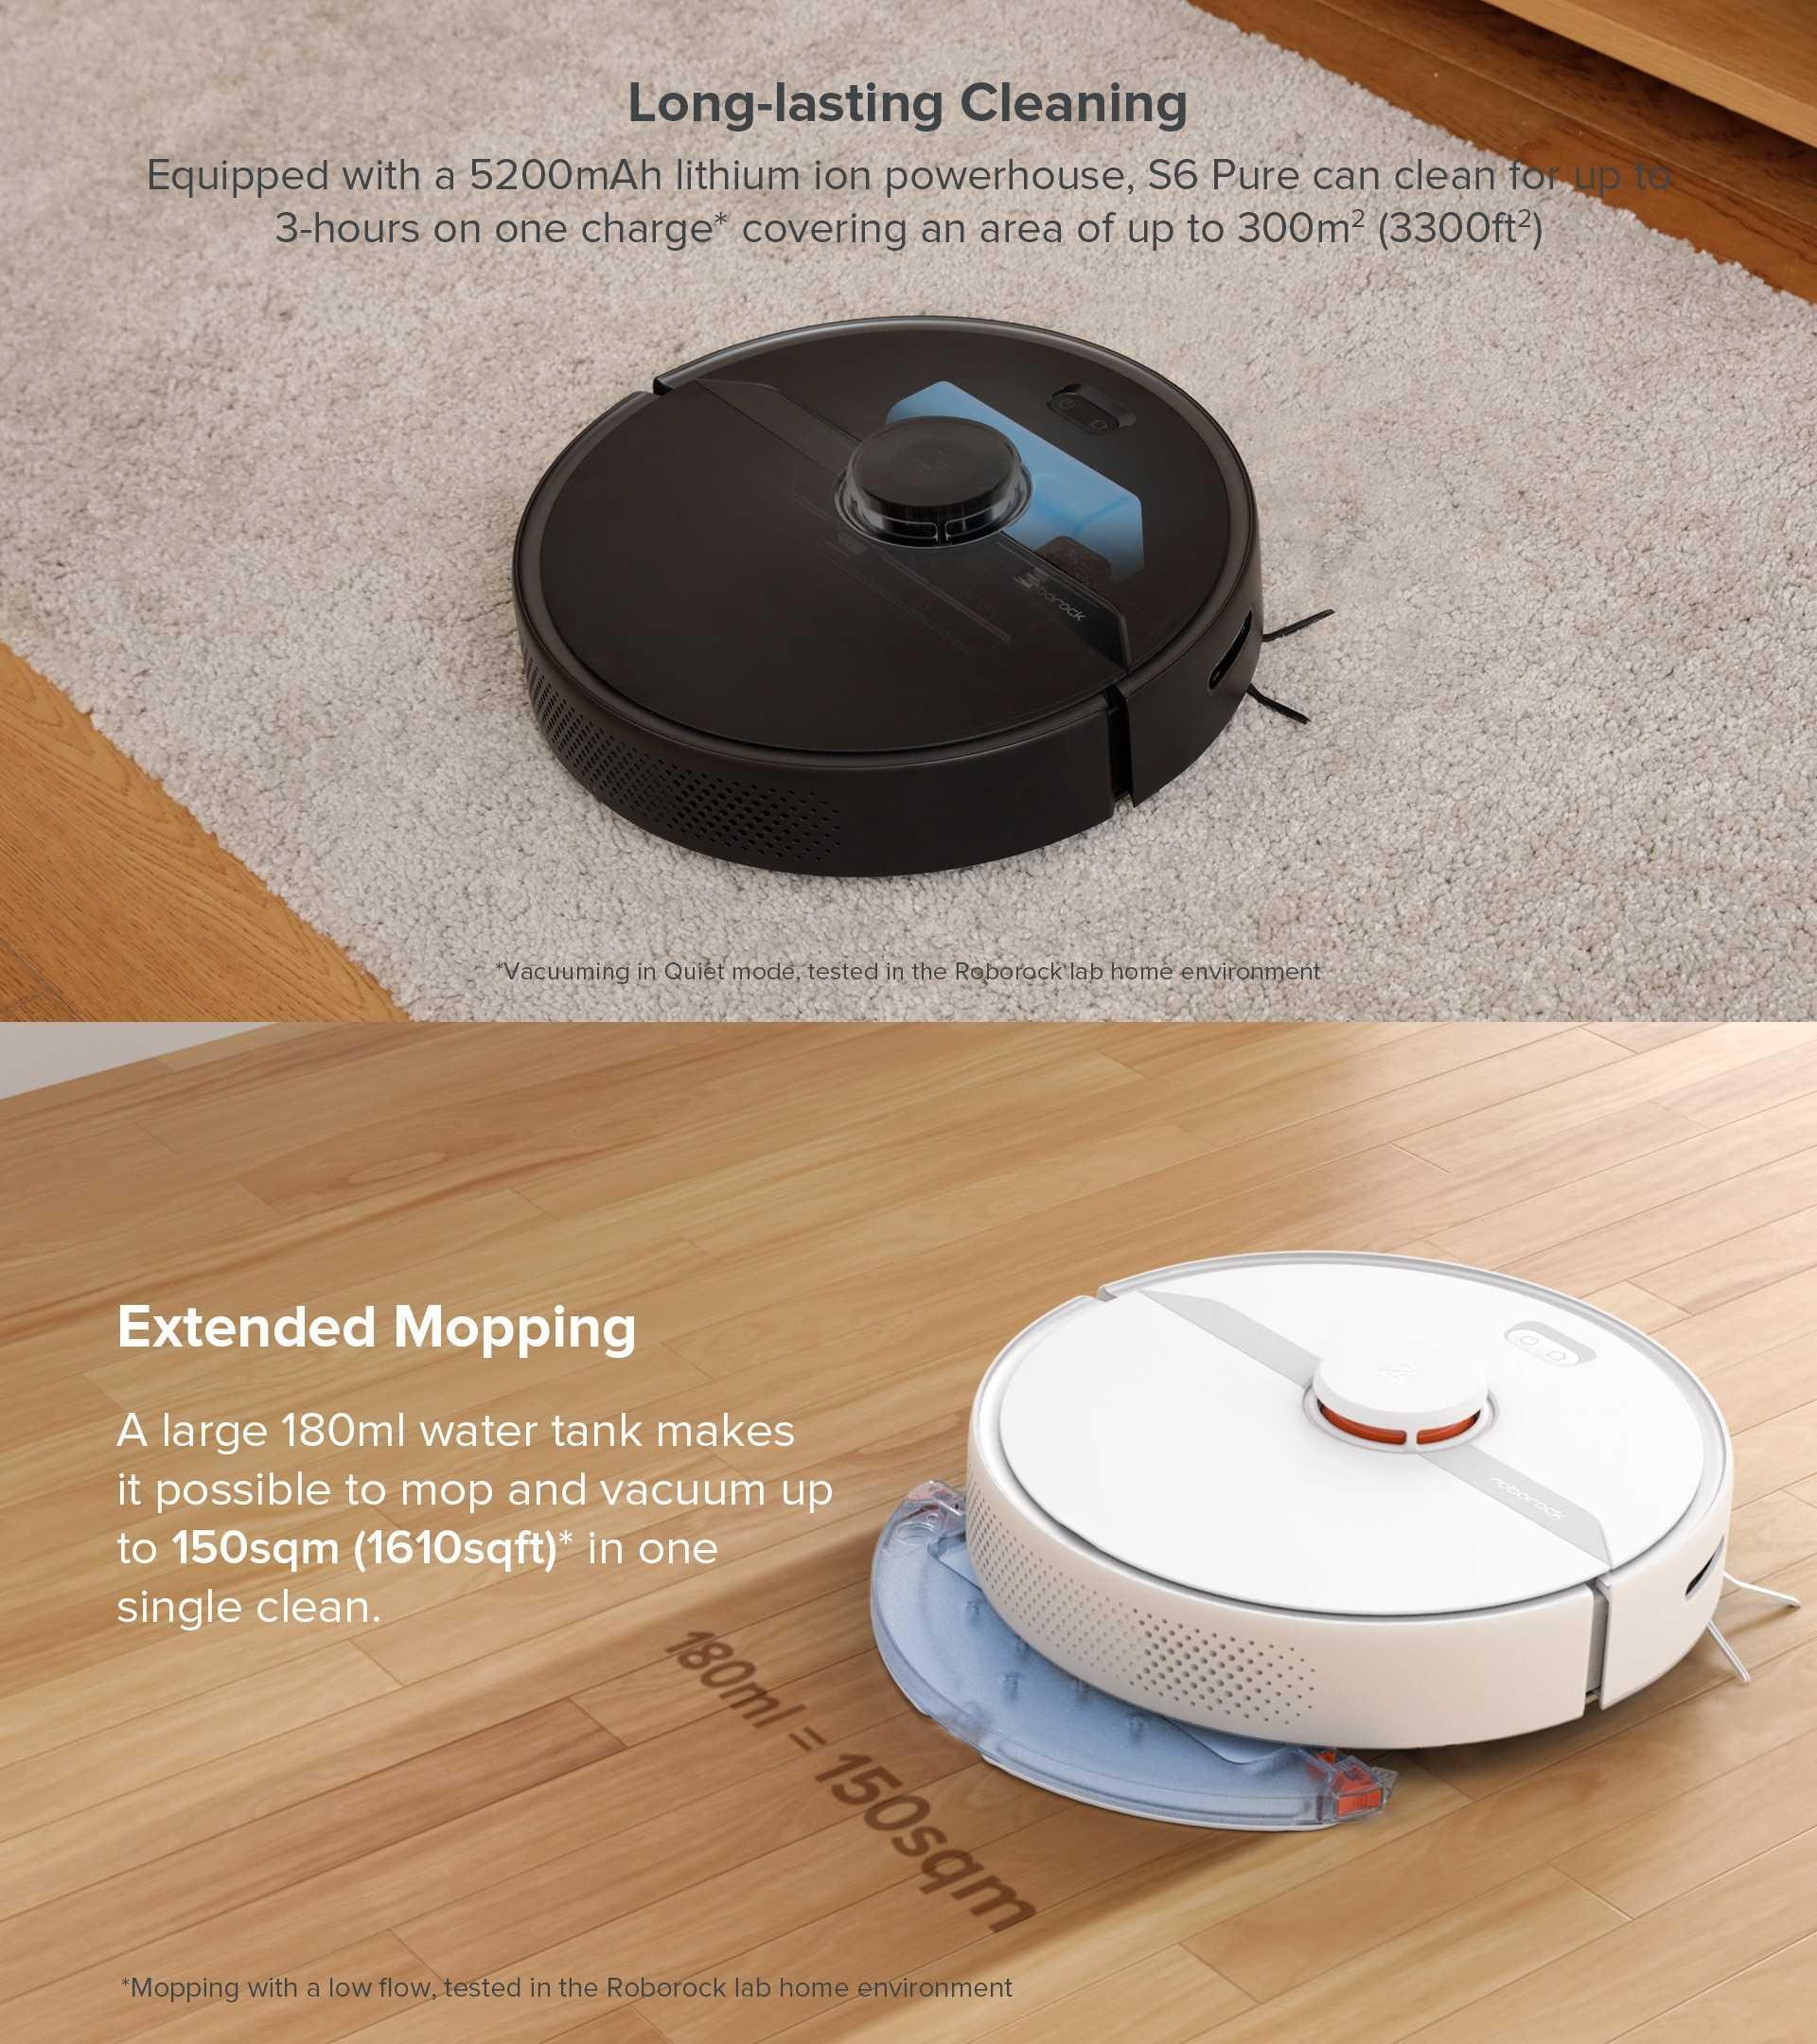 XiaoMi Youpin Roborock S6 Pure Robot Vacuum Cleaner Wholesale